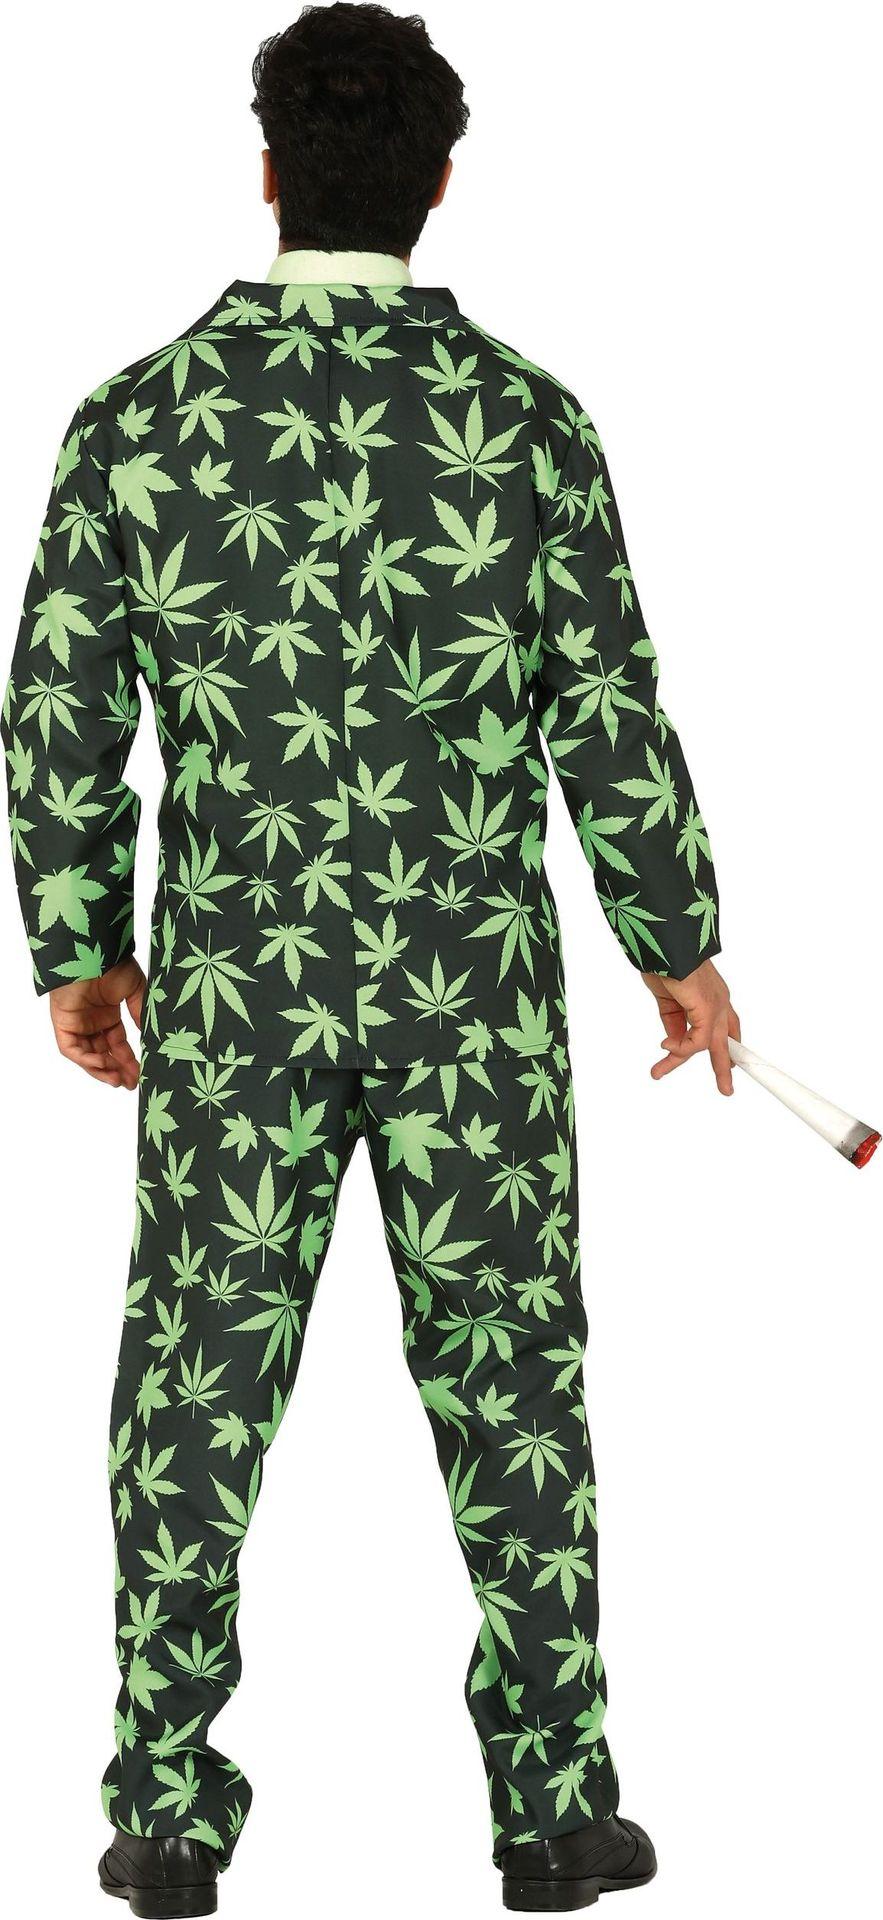 Marihuana kostuum